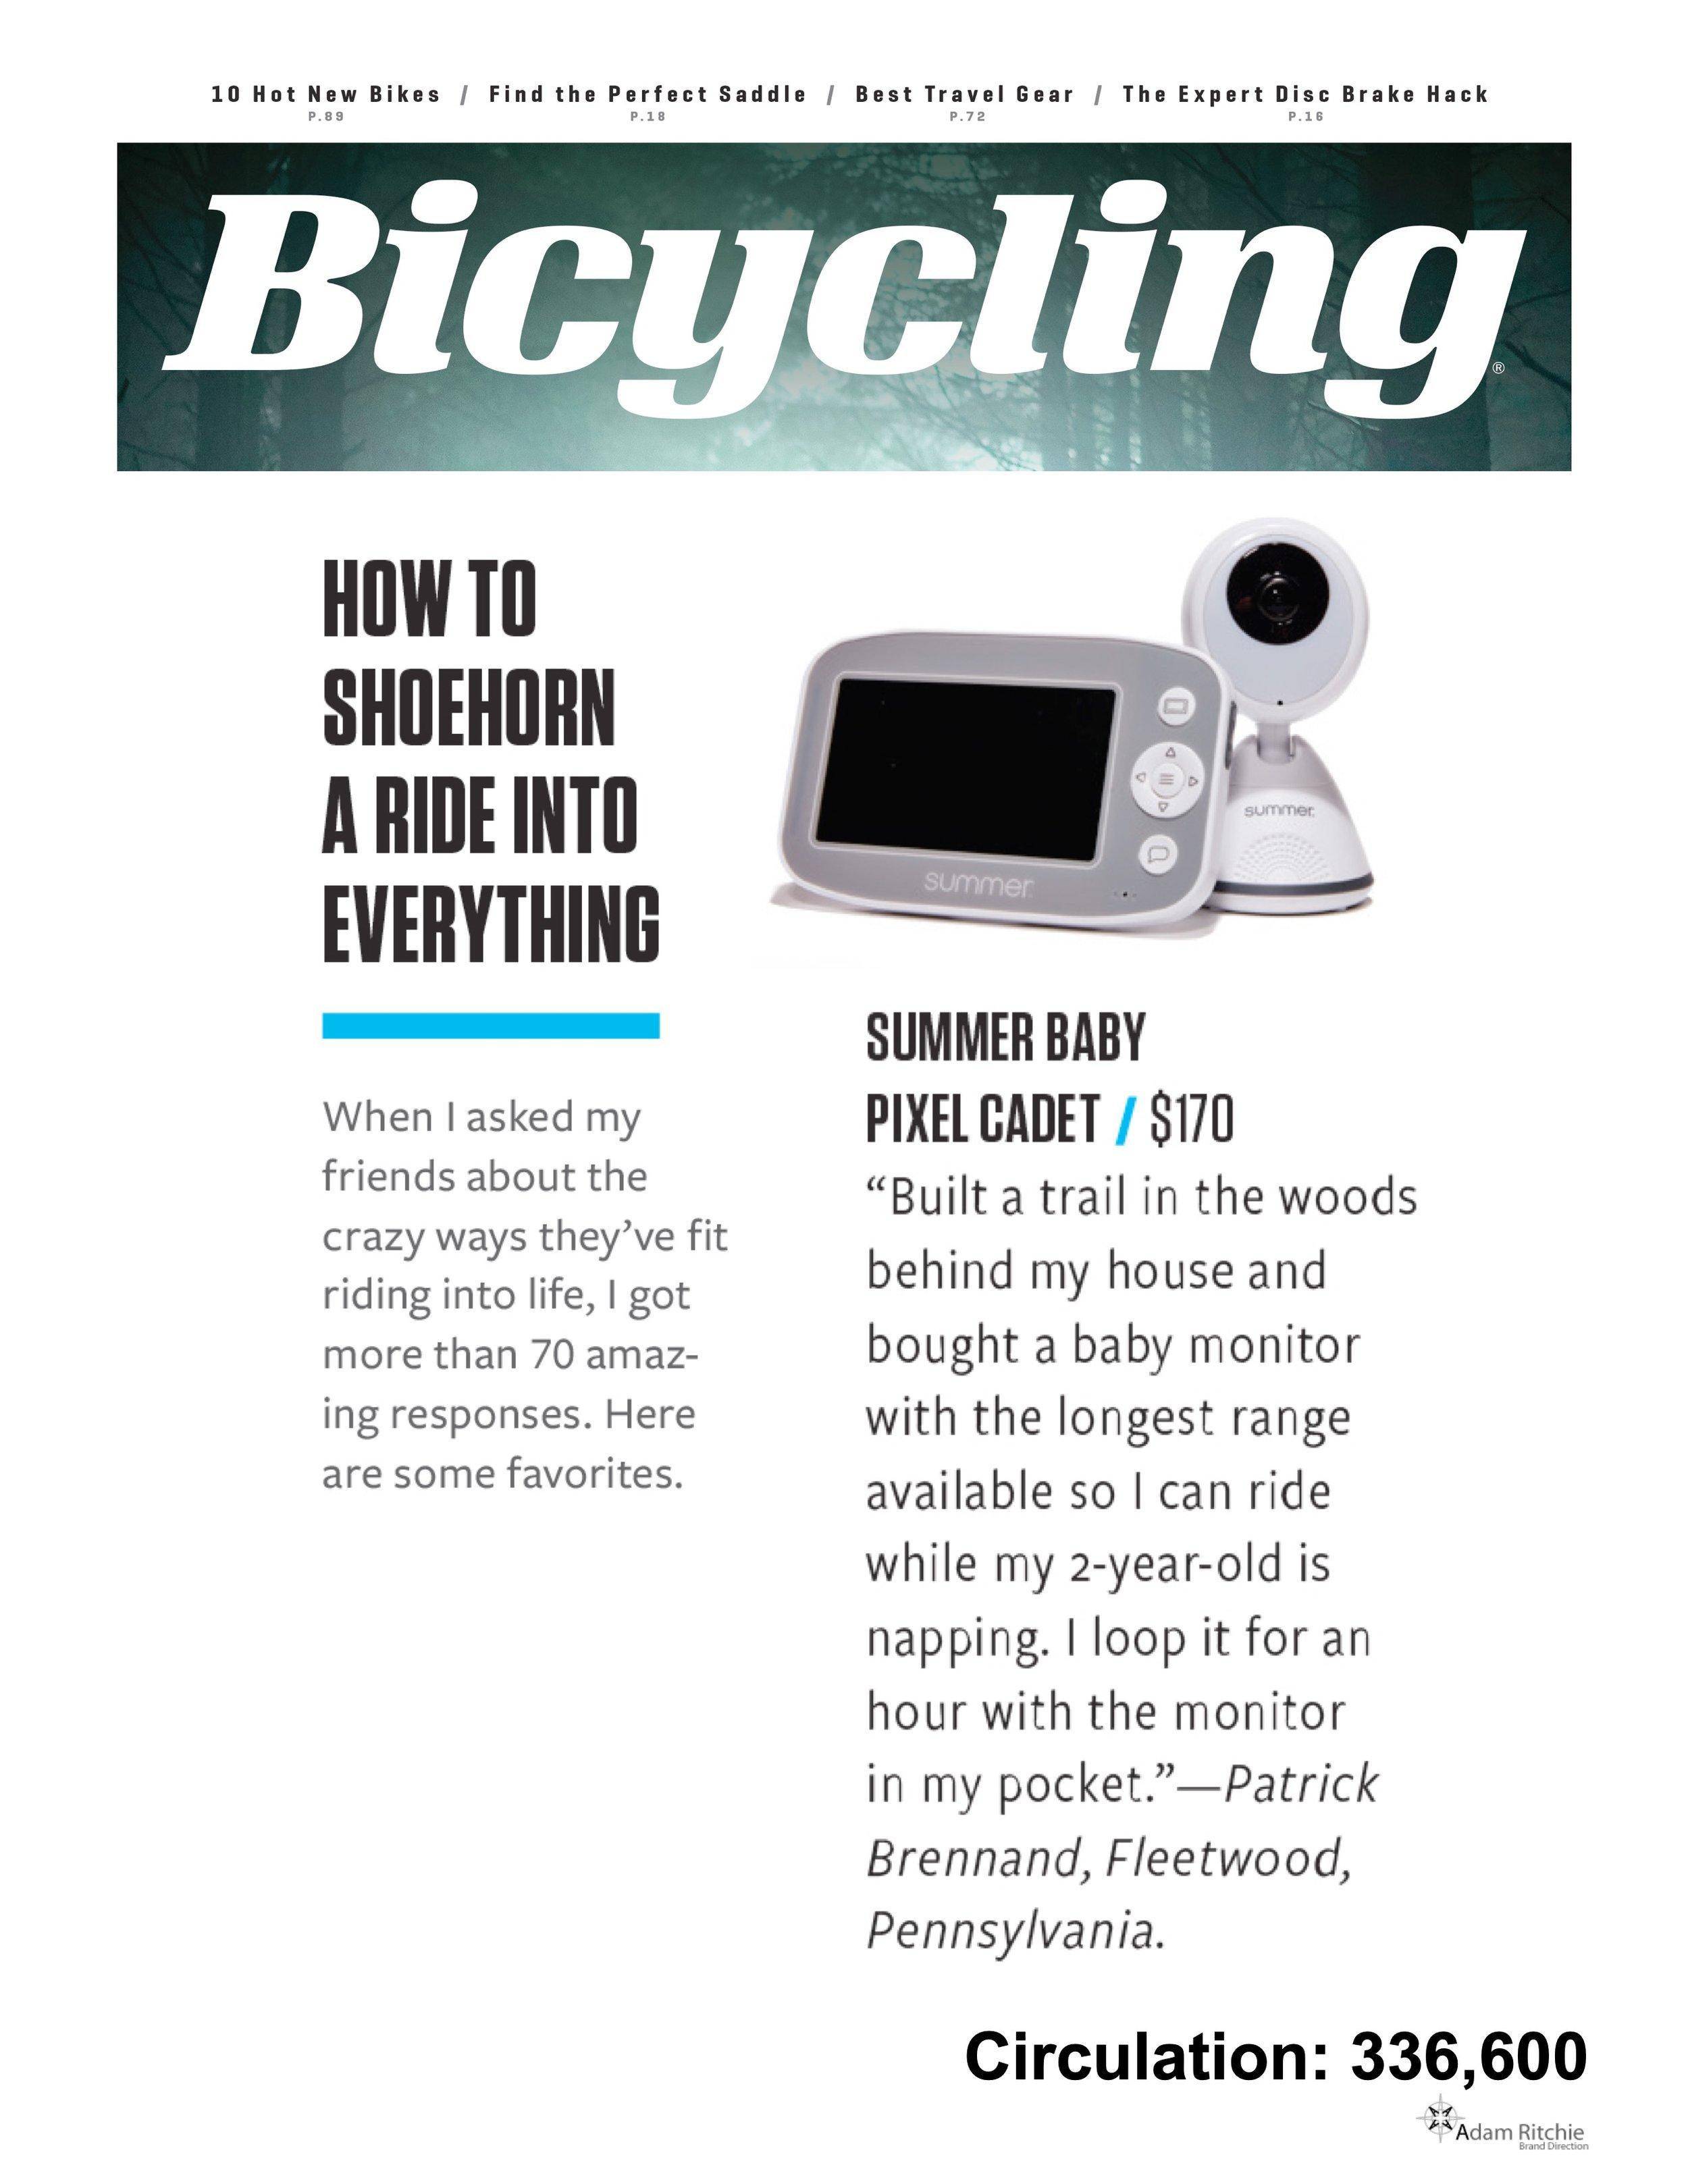 2019.03.00_Bicycling_Summer Baby Pixel Cadet Monitor.jpeg